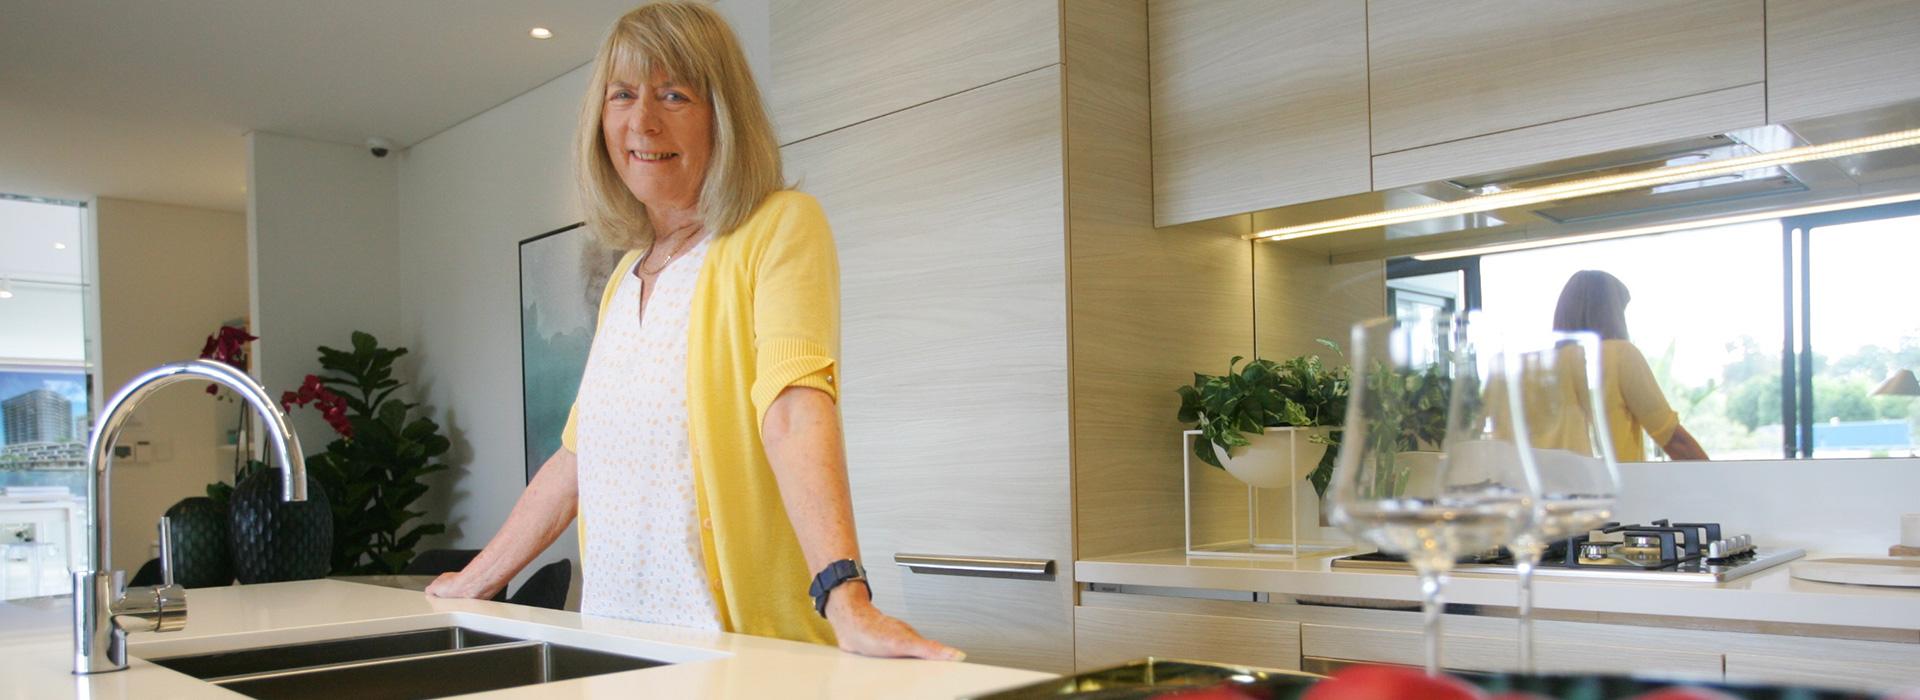 Meet Esplanade resident, Carol Blaschke